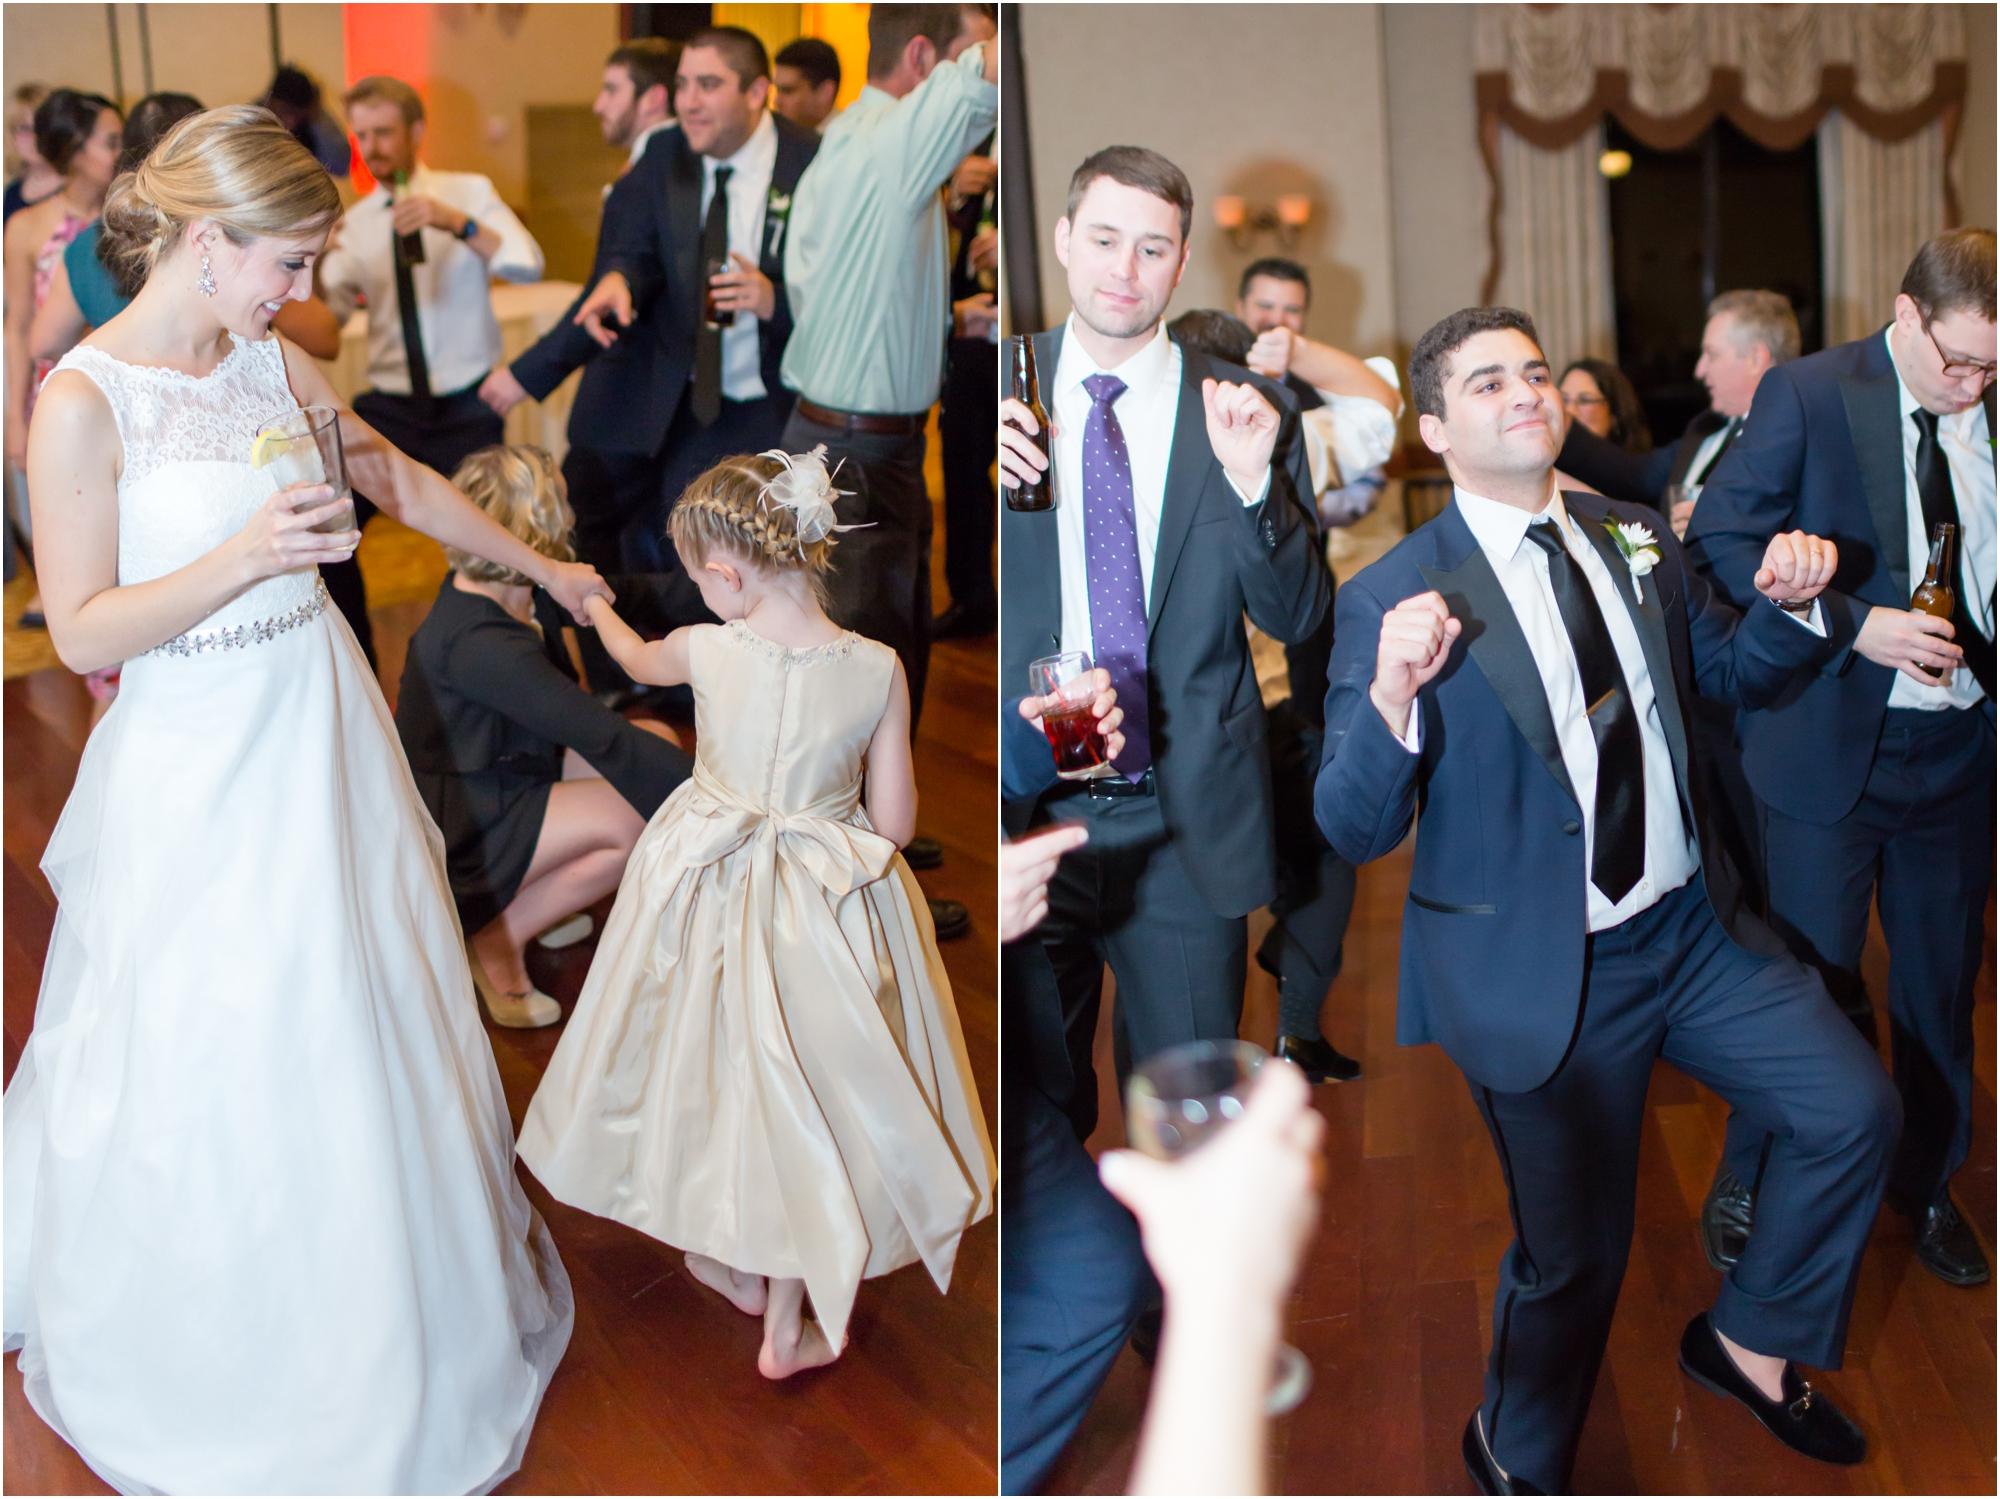 6-Finkel Wedding Reception-937_anna grace photography maryland wedding photographer turf valley.jpg